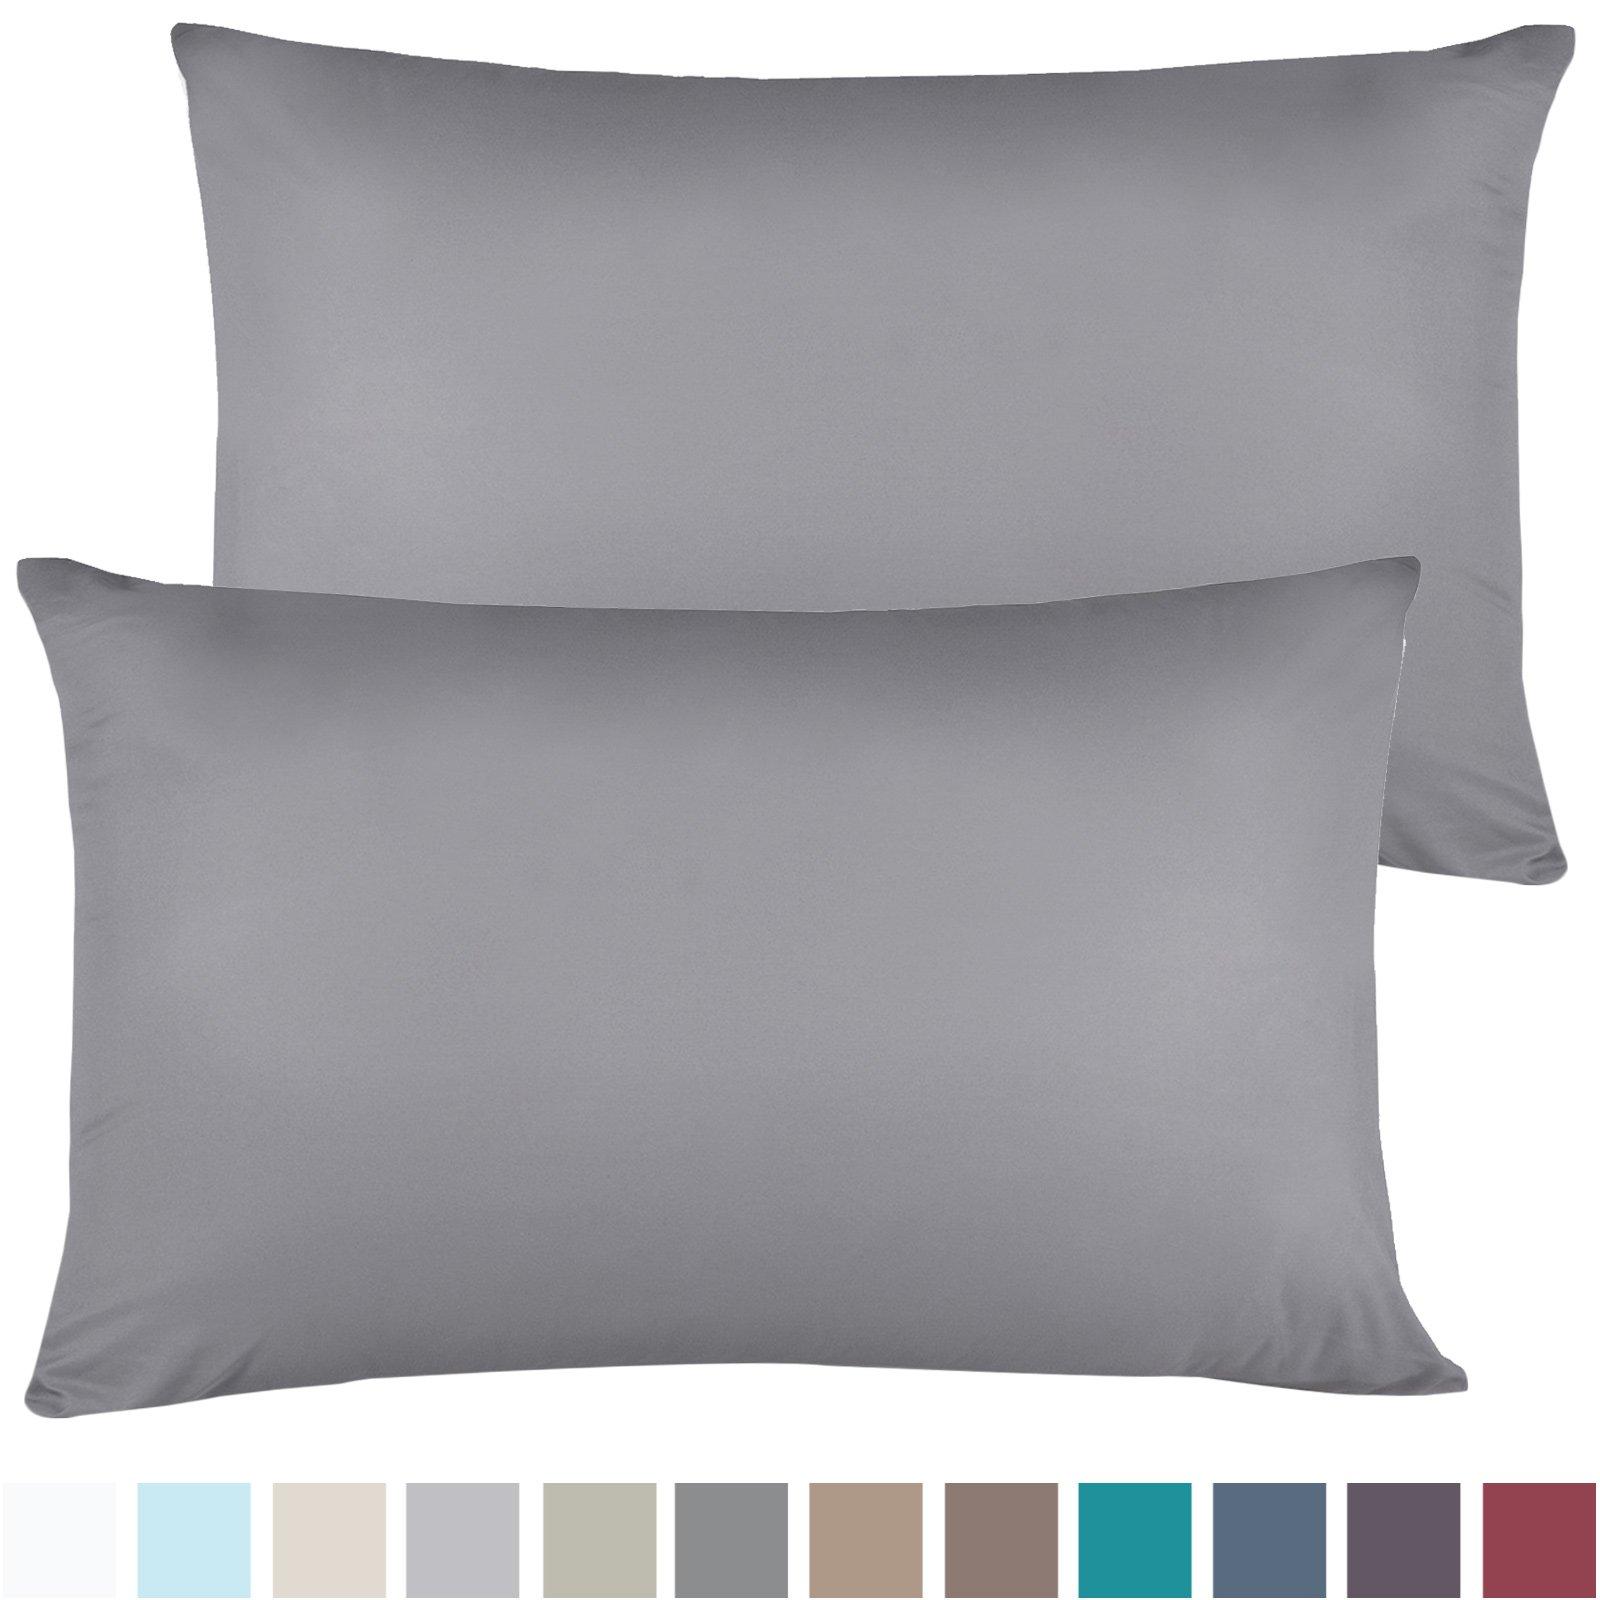 Empyrean Bedding Set of 2 Premium Standard-Size Pillowcases Microfiber Linen, Hypoallergenic & Breathable Design, Soft & Comfortable Hotel Luxury – Charcoal Gray